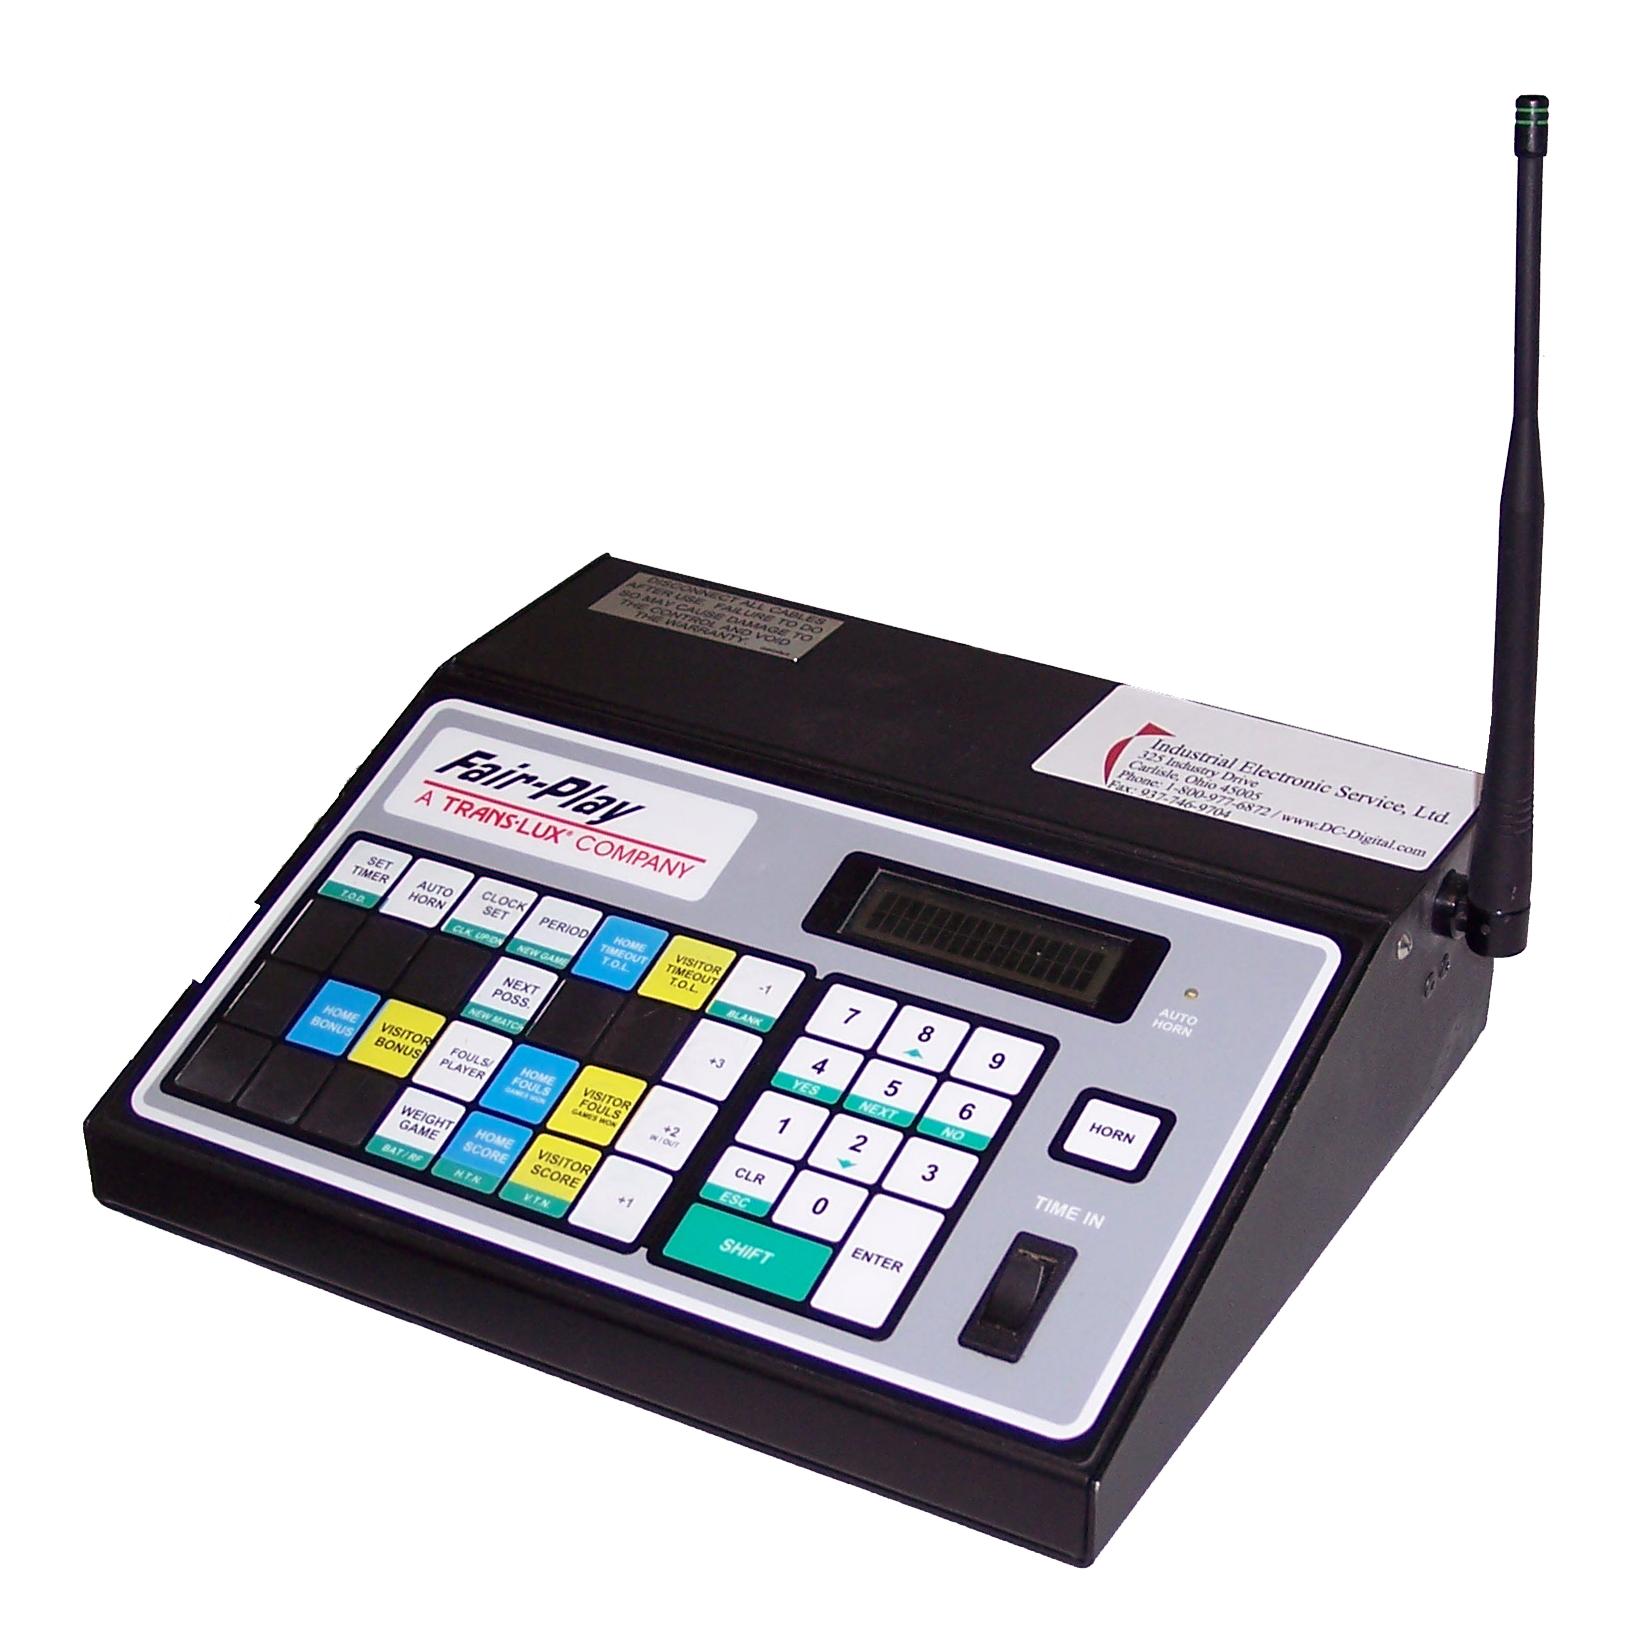 Fair-play-MP-70-0111-Wireless-Control-Console